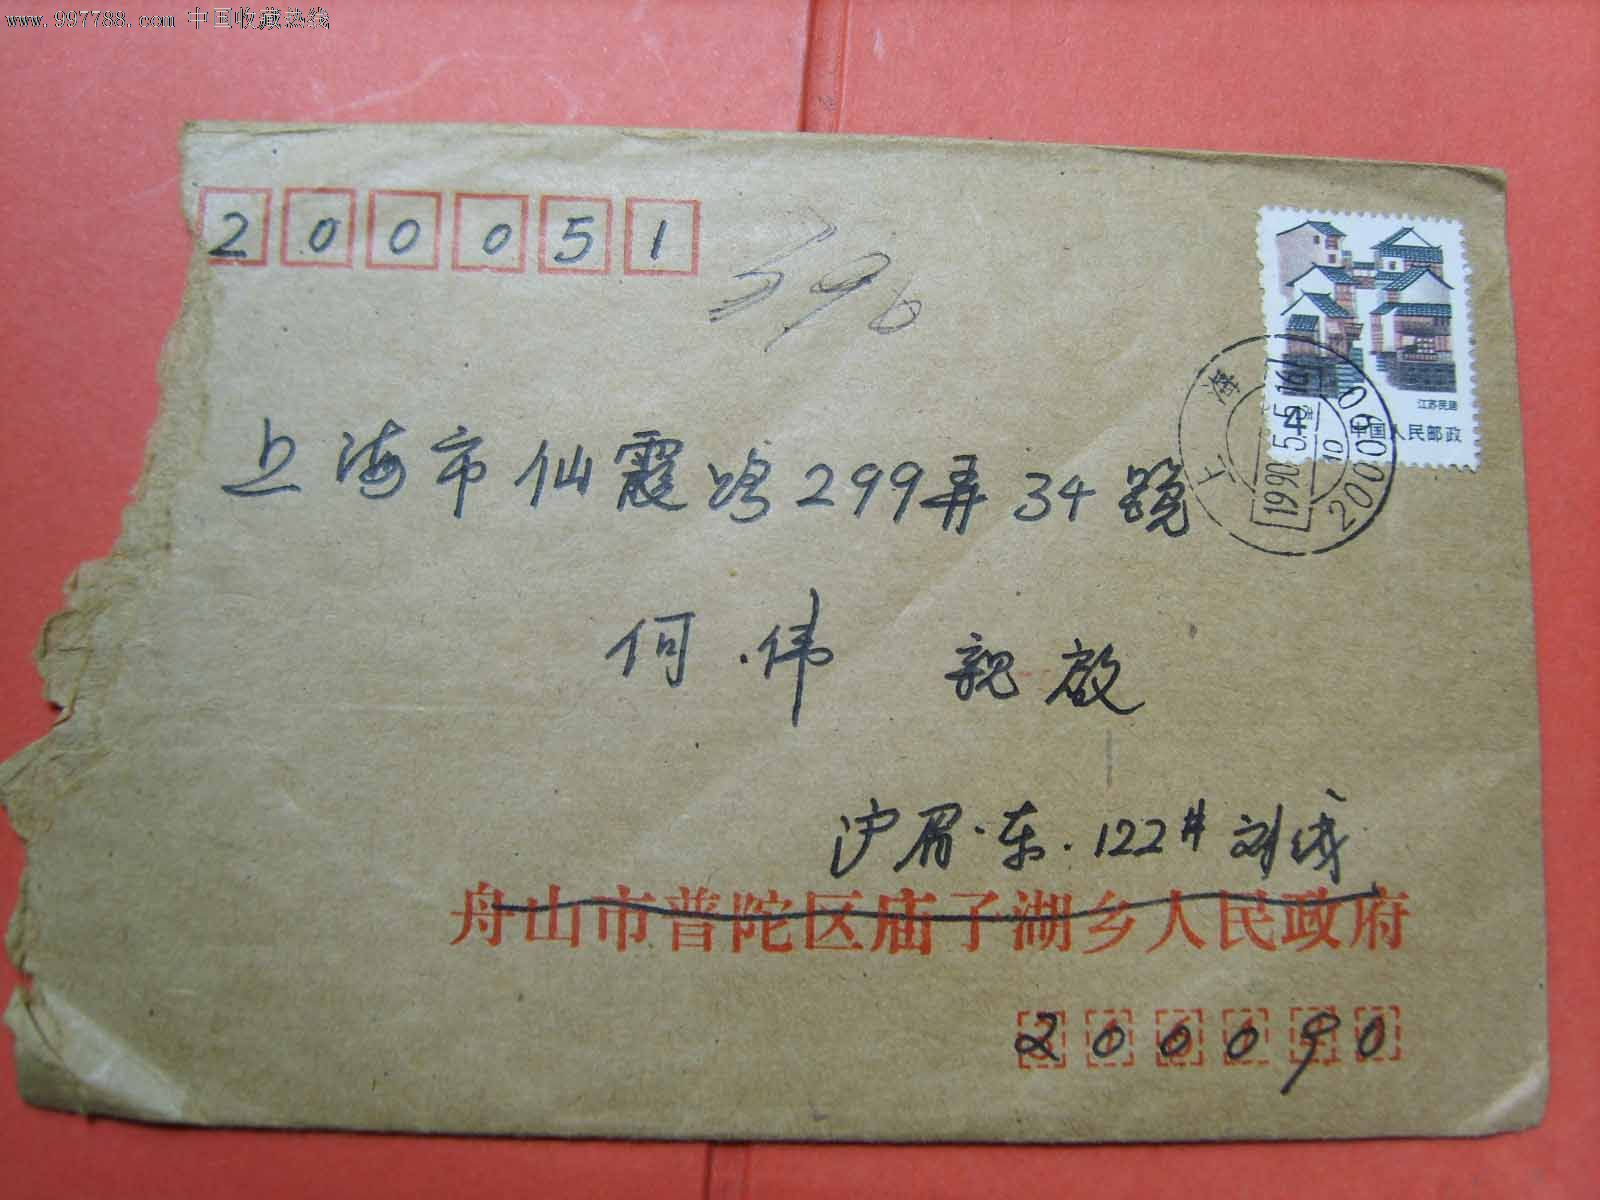 Q212上海寄信请写邮政编码机盖宣传戳封